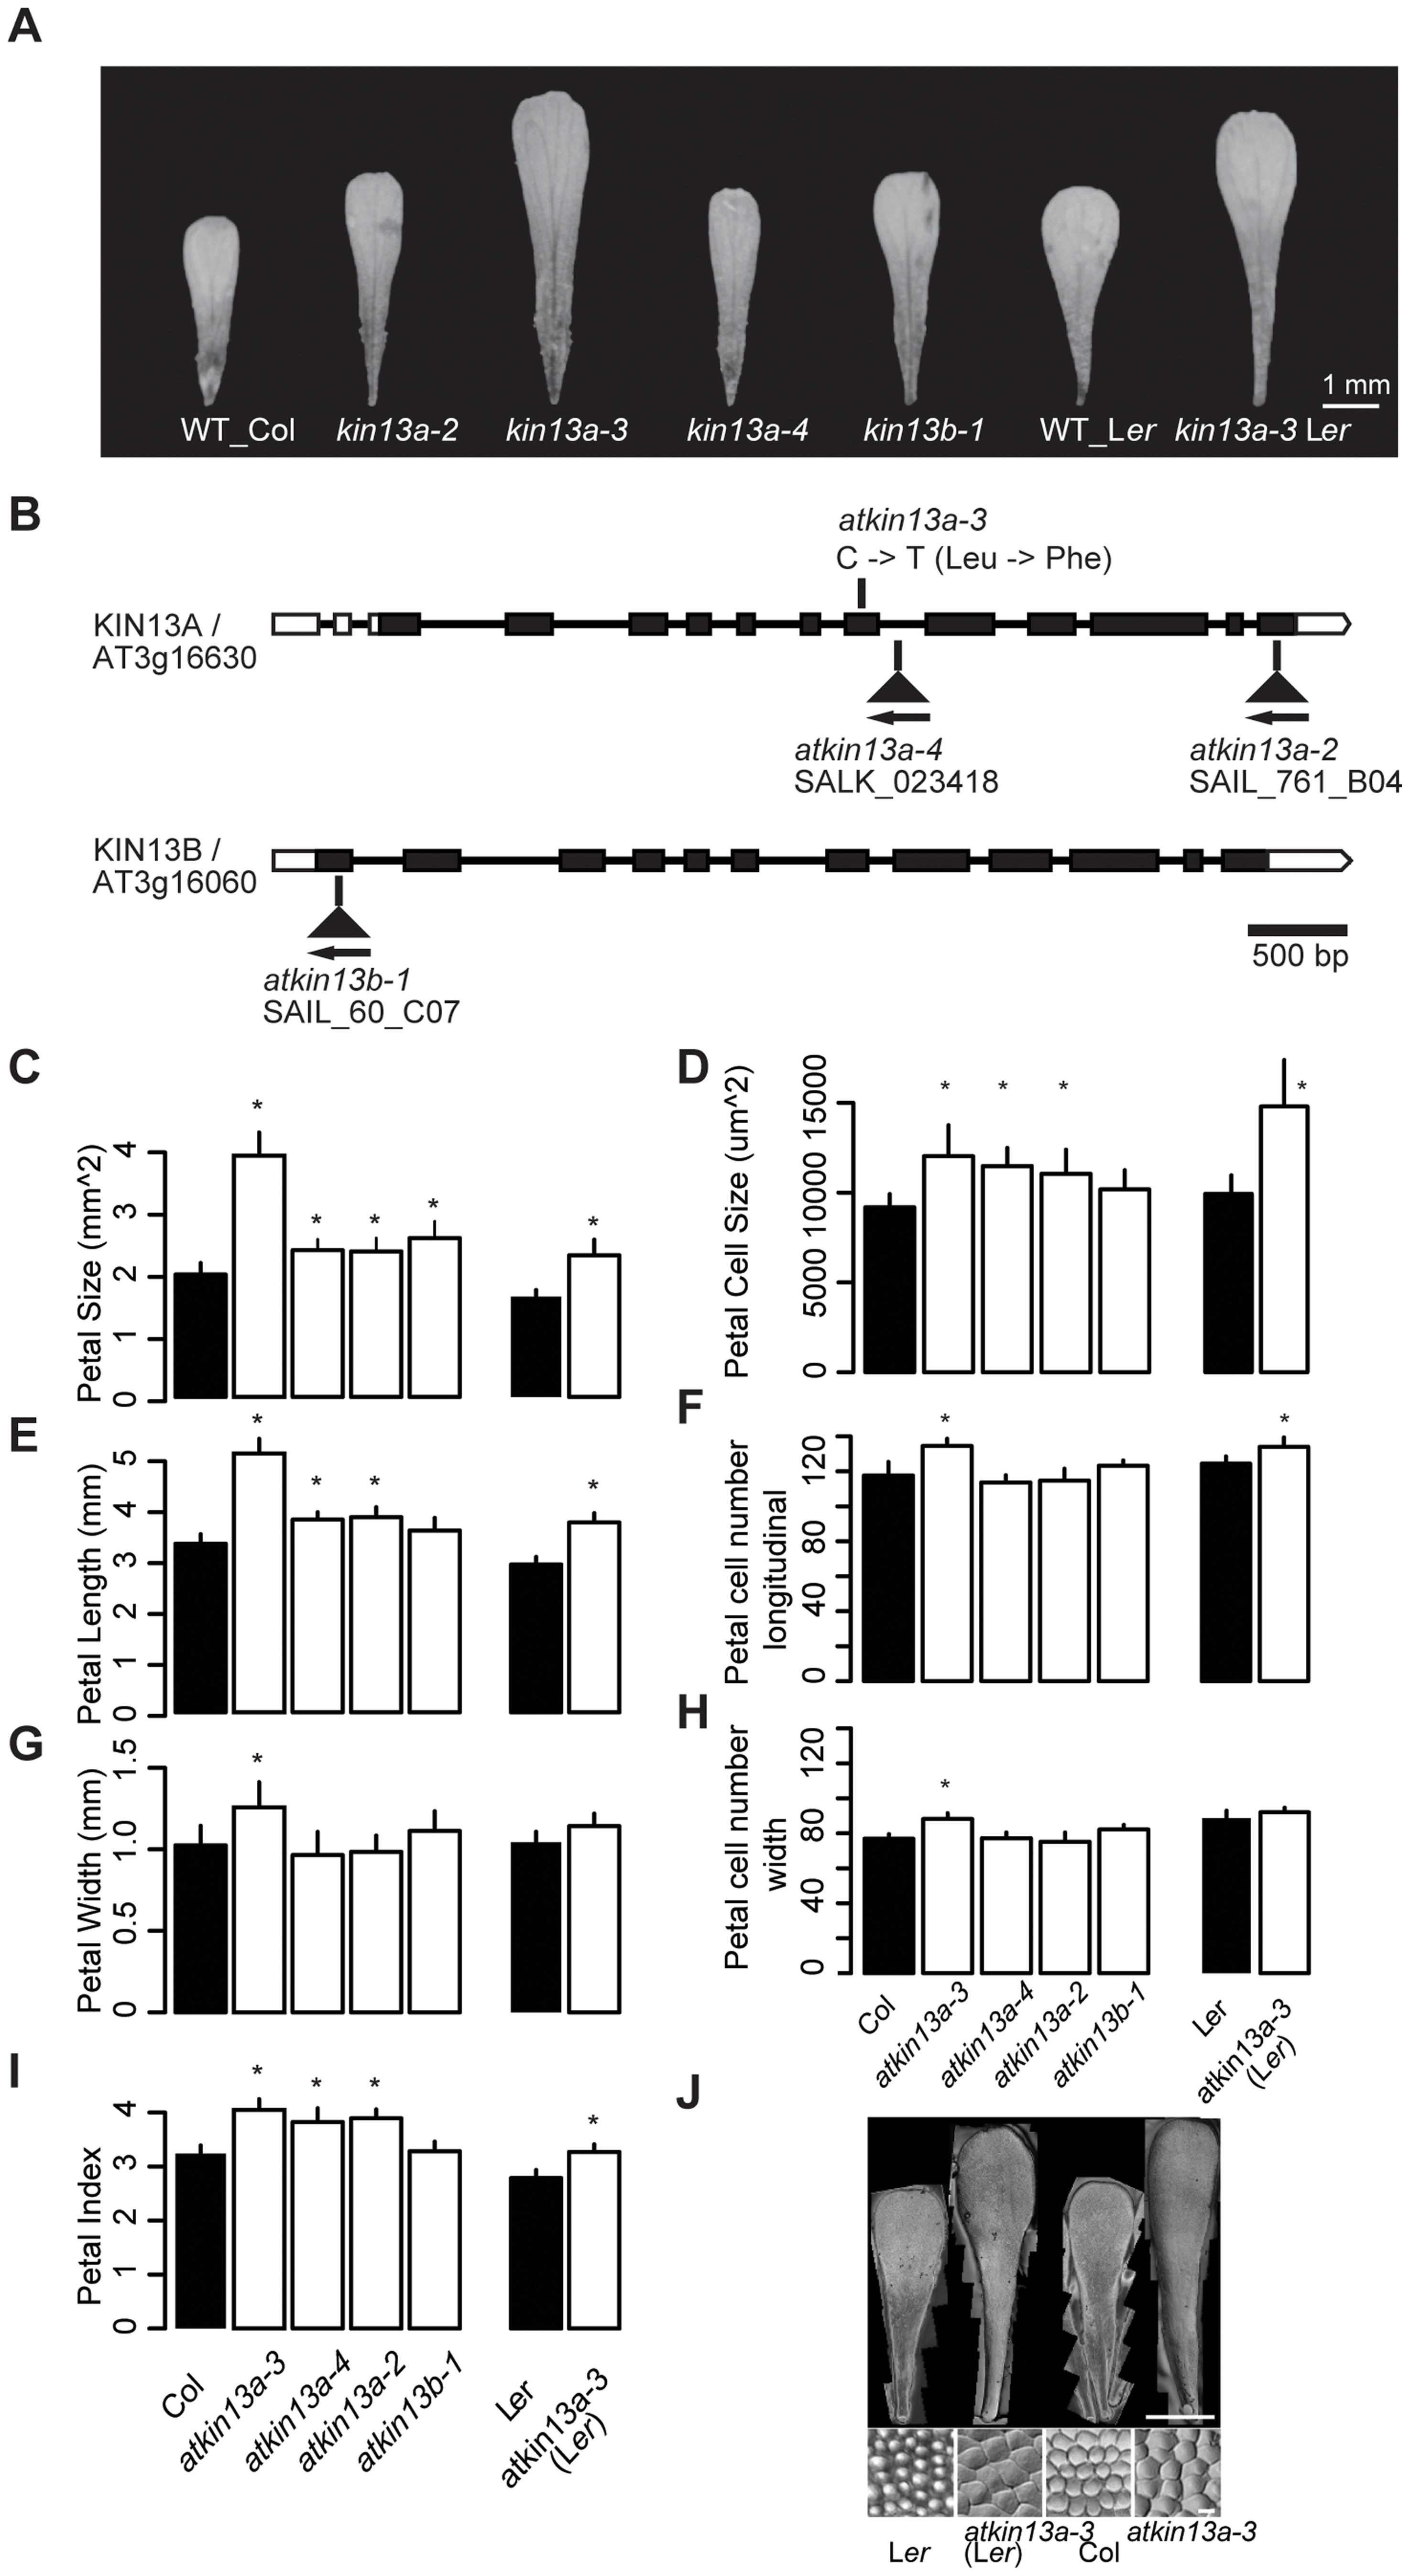 Petal phenotypes of <i>atkin13a</i> and <i>atkin13b</i> loss-of-function mutants.